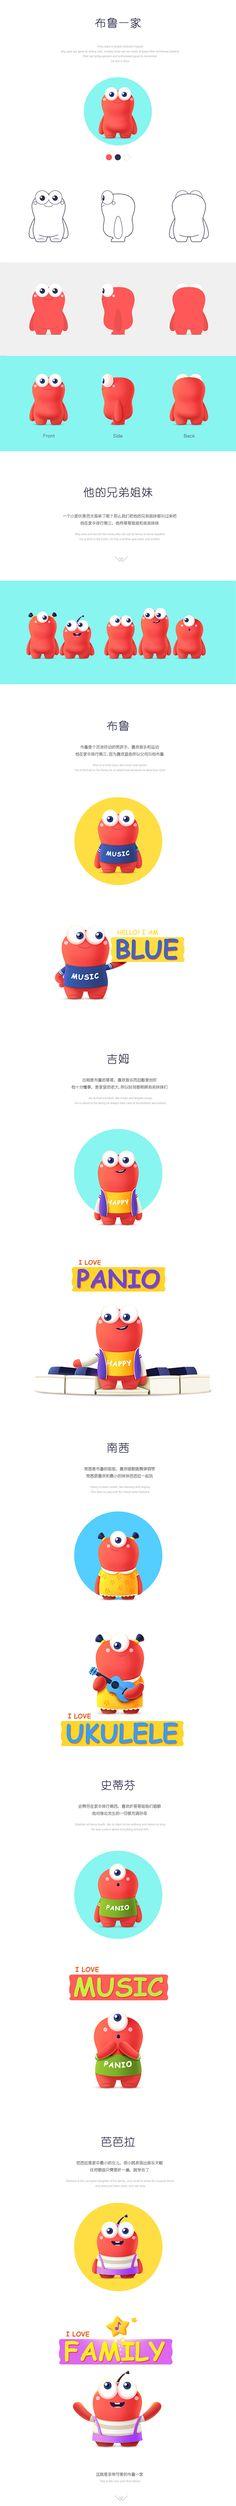 Character Design,Mascot Design